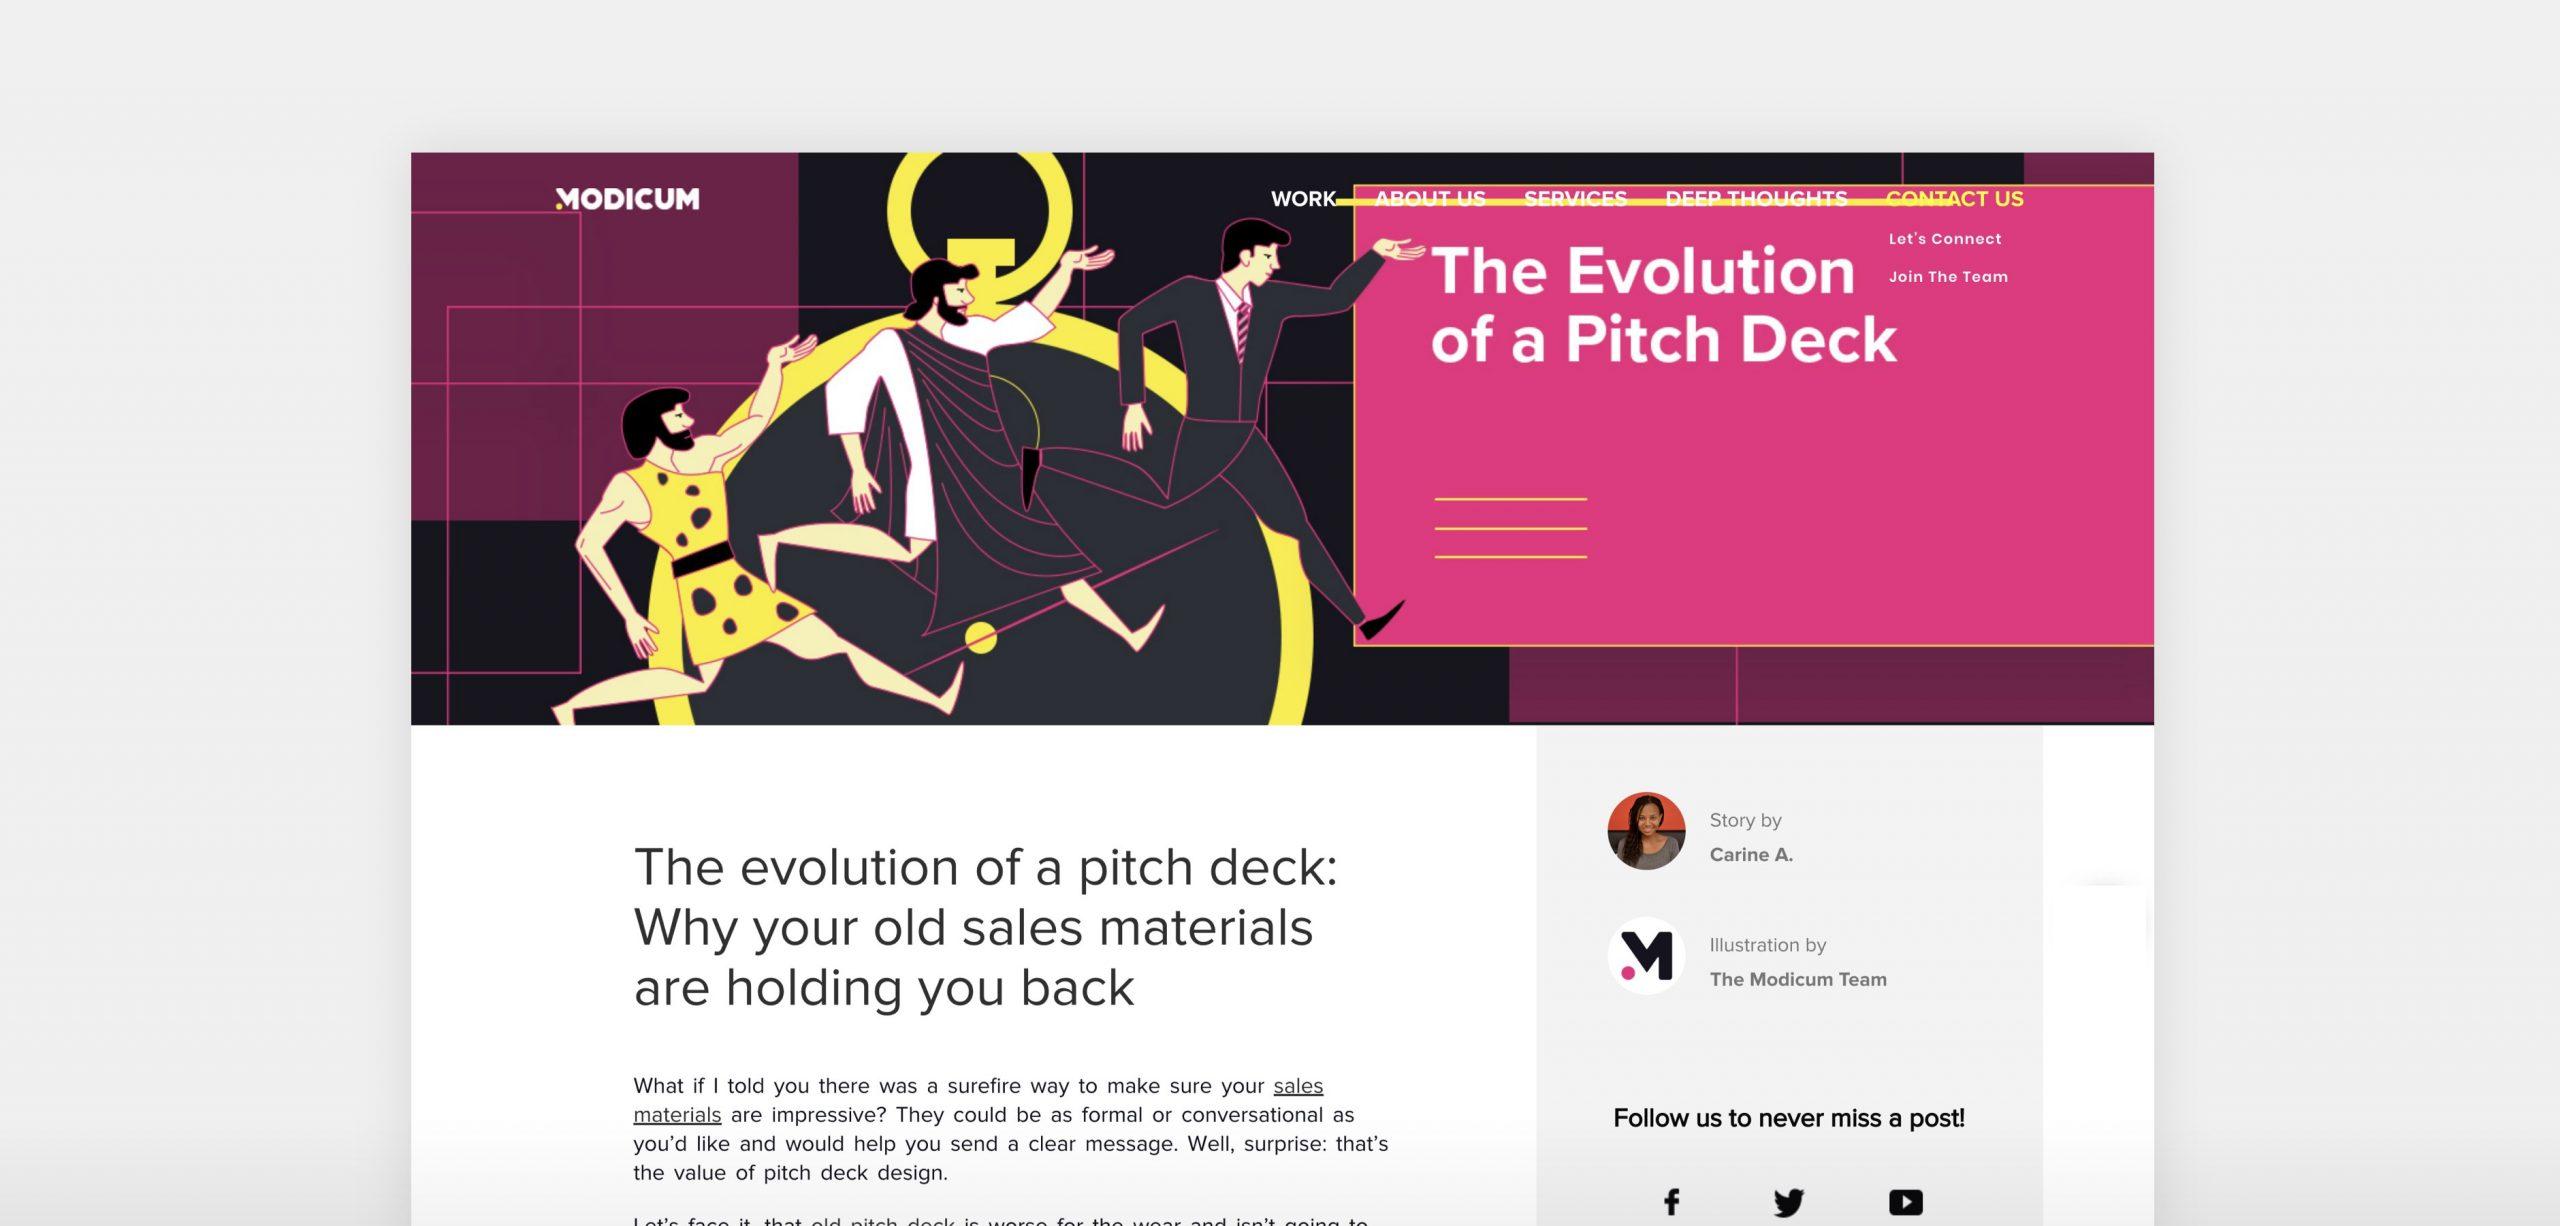 Modicum-Blog-Mockup-Evolution-Pitch-Deck